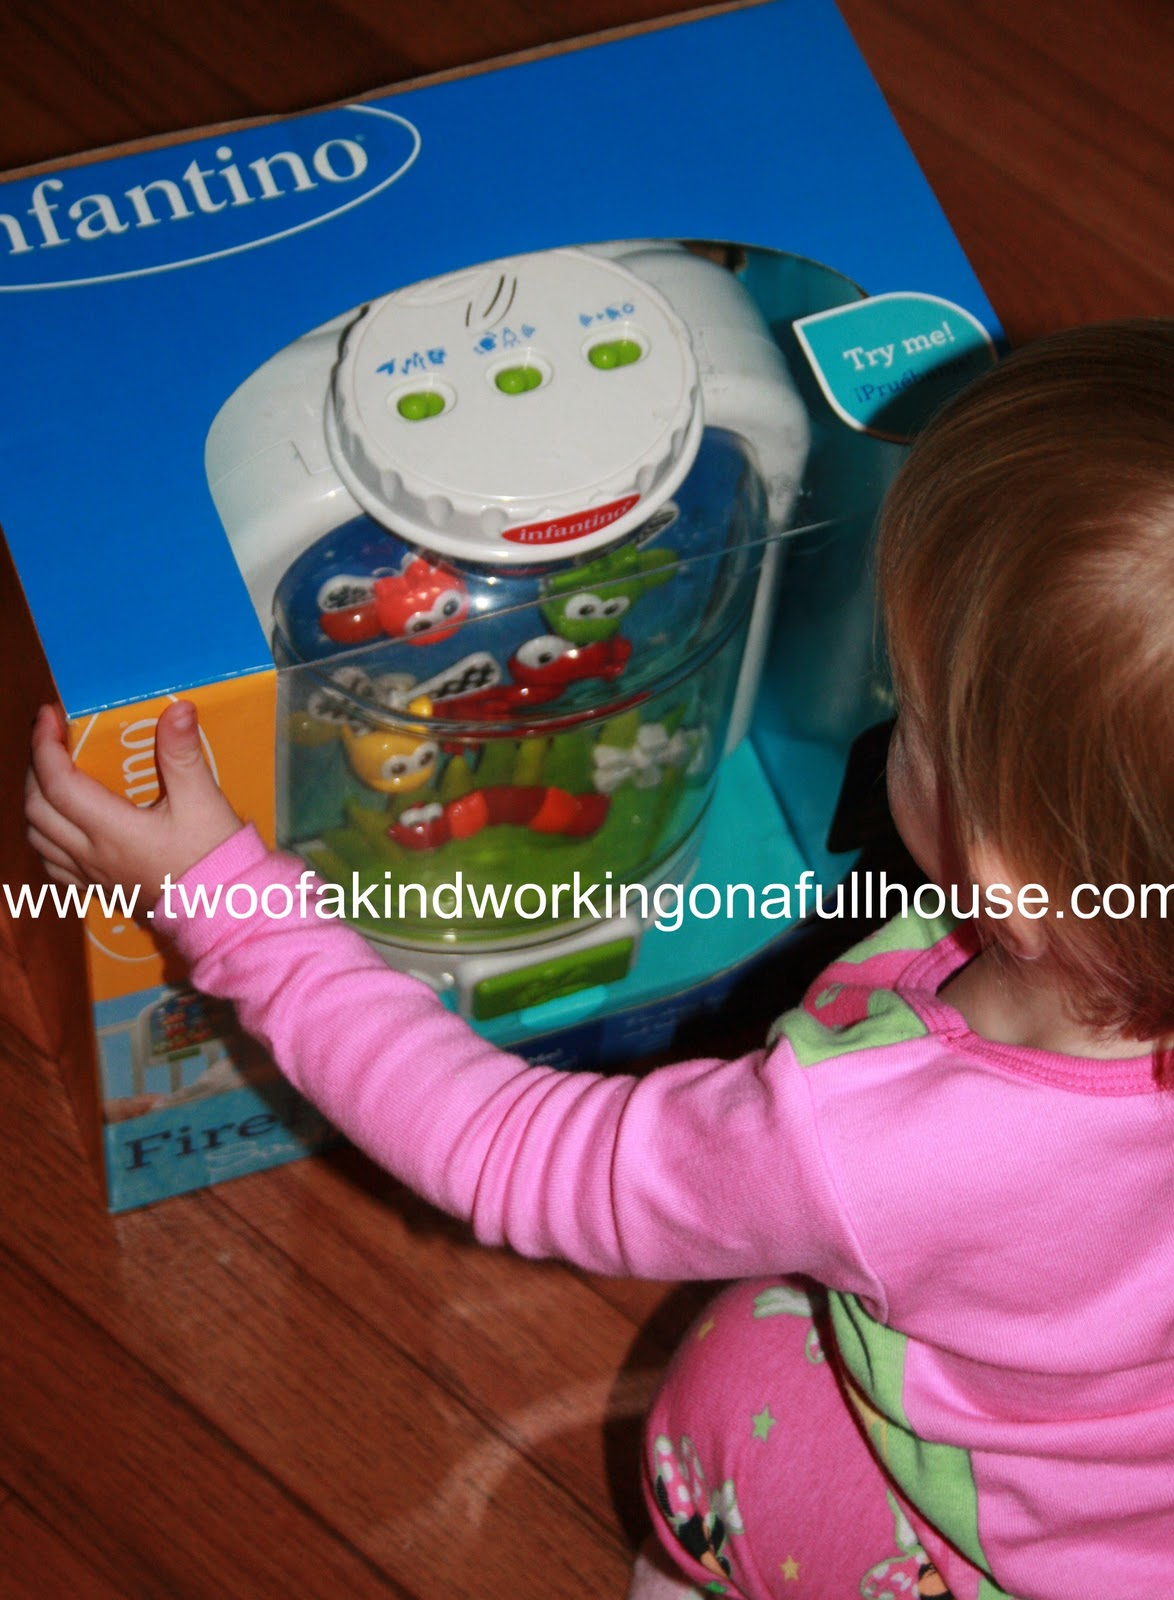 http://2.bp.blogspot.com/_sDaGNDG07Aw/TPZwGk9Xi4I/AAAAAAAAEG4/7qkLUGxeO7k/s1600/infantino.jpg